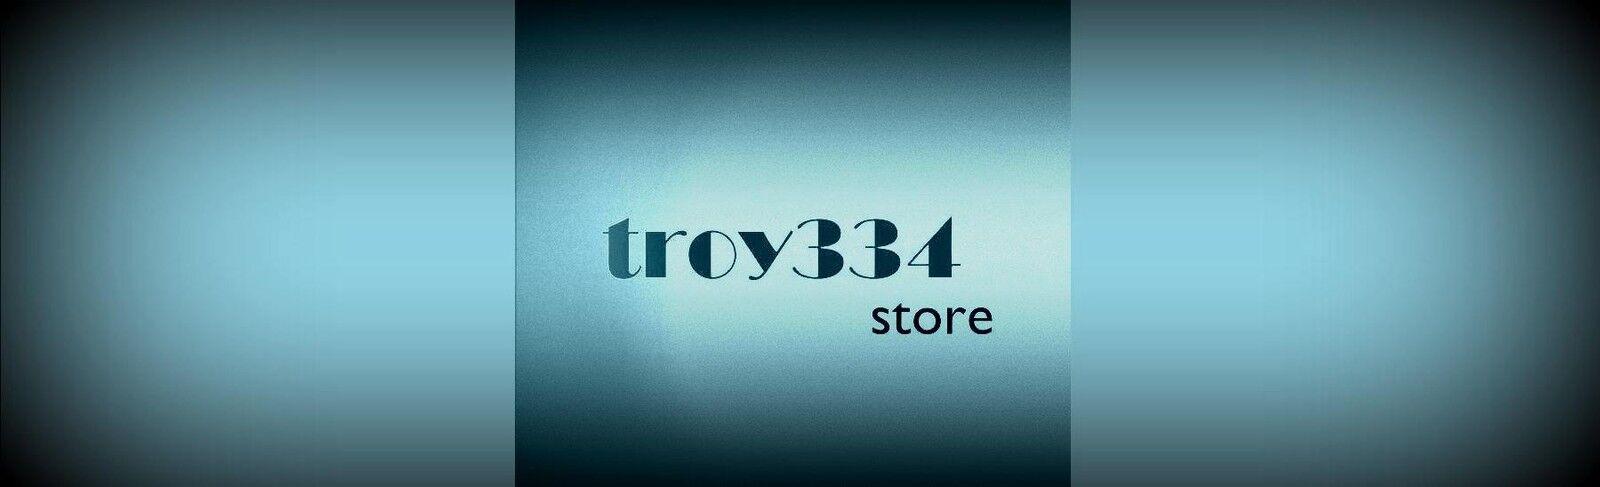 troy334